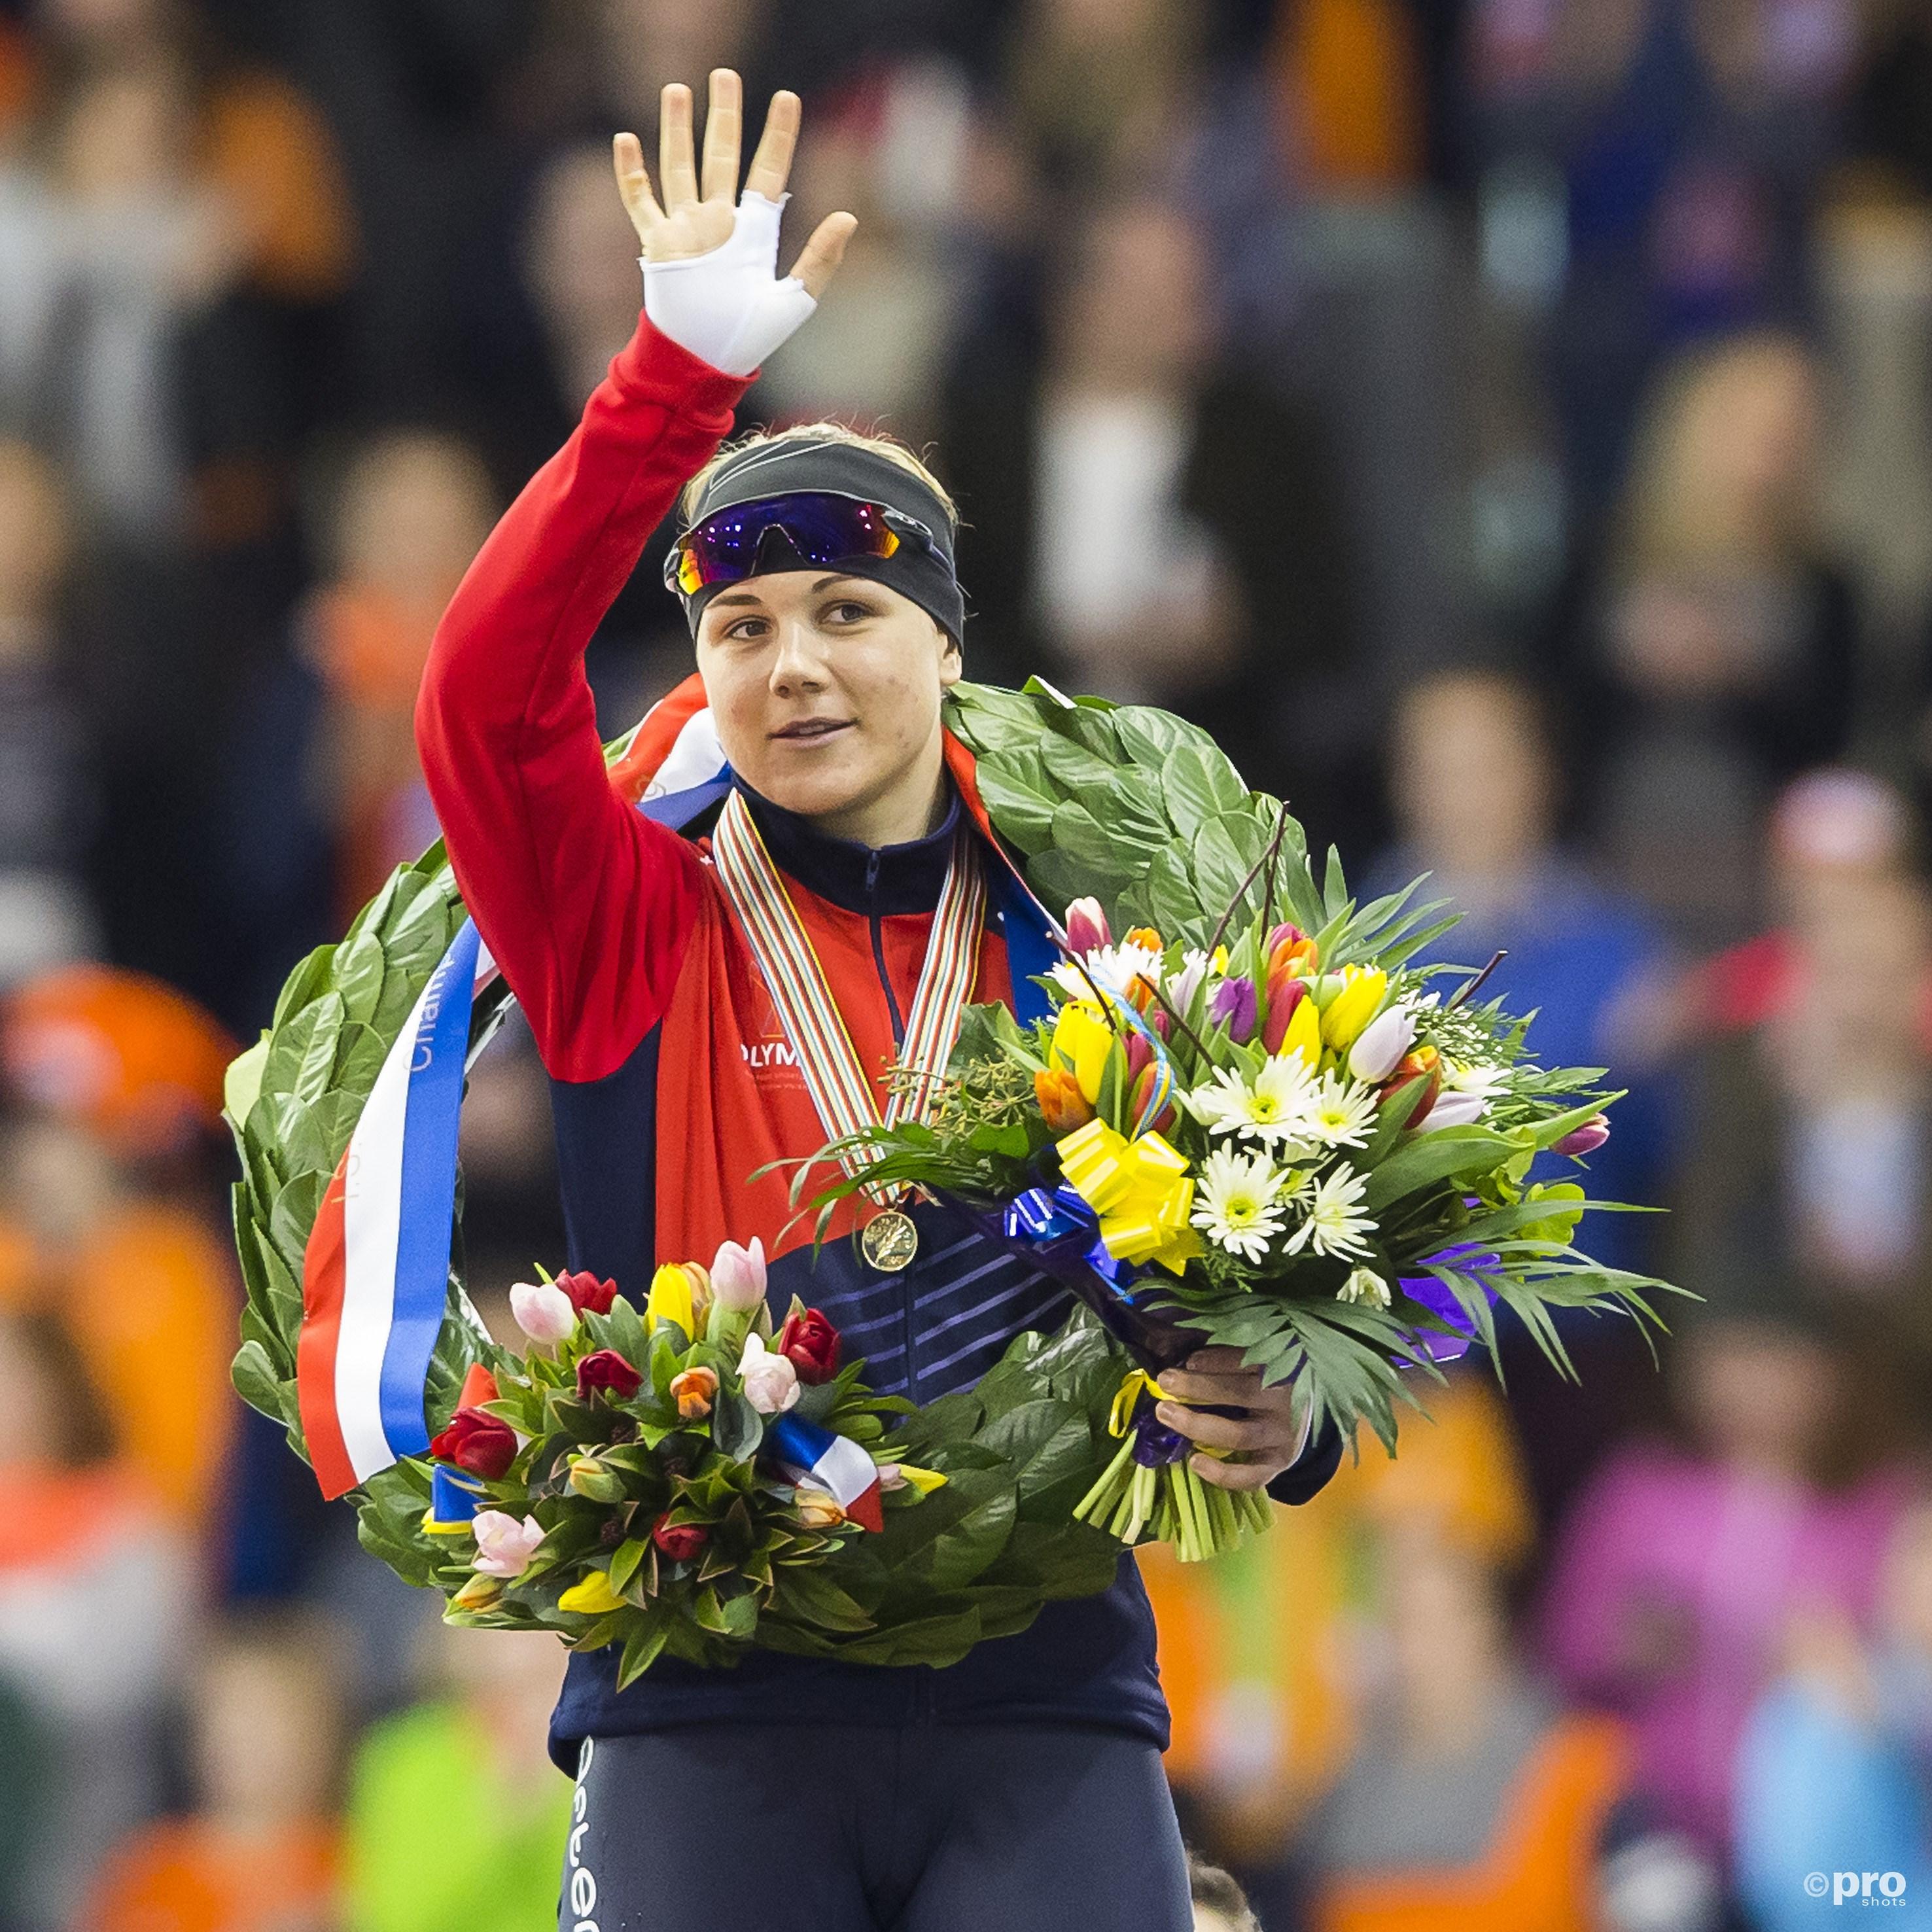 Erbanova zegeviert op de sprint. (PRO SHOTS/Erik Pasman)